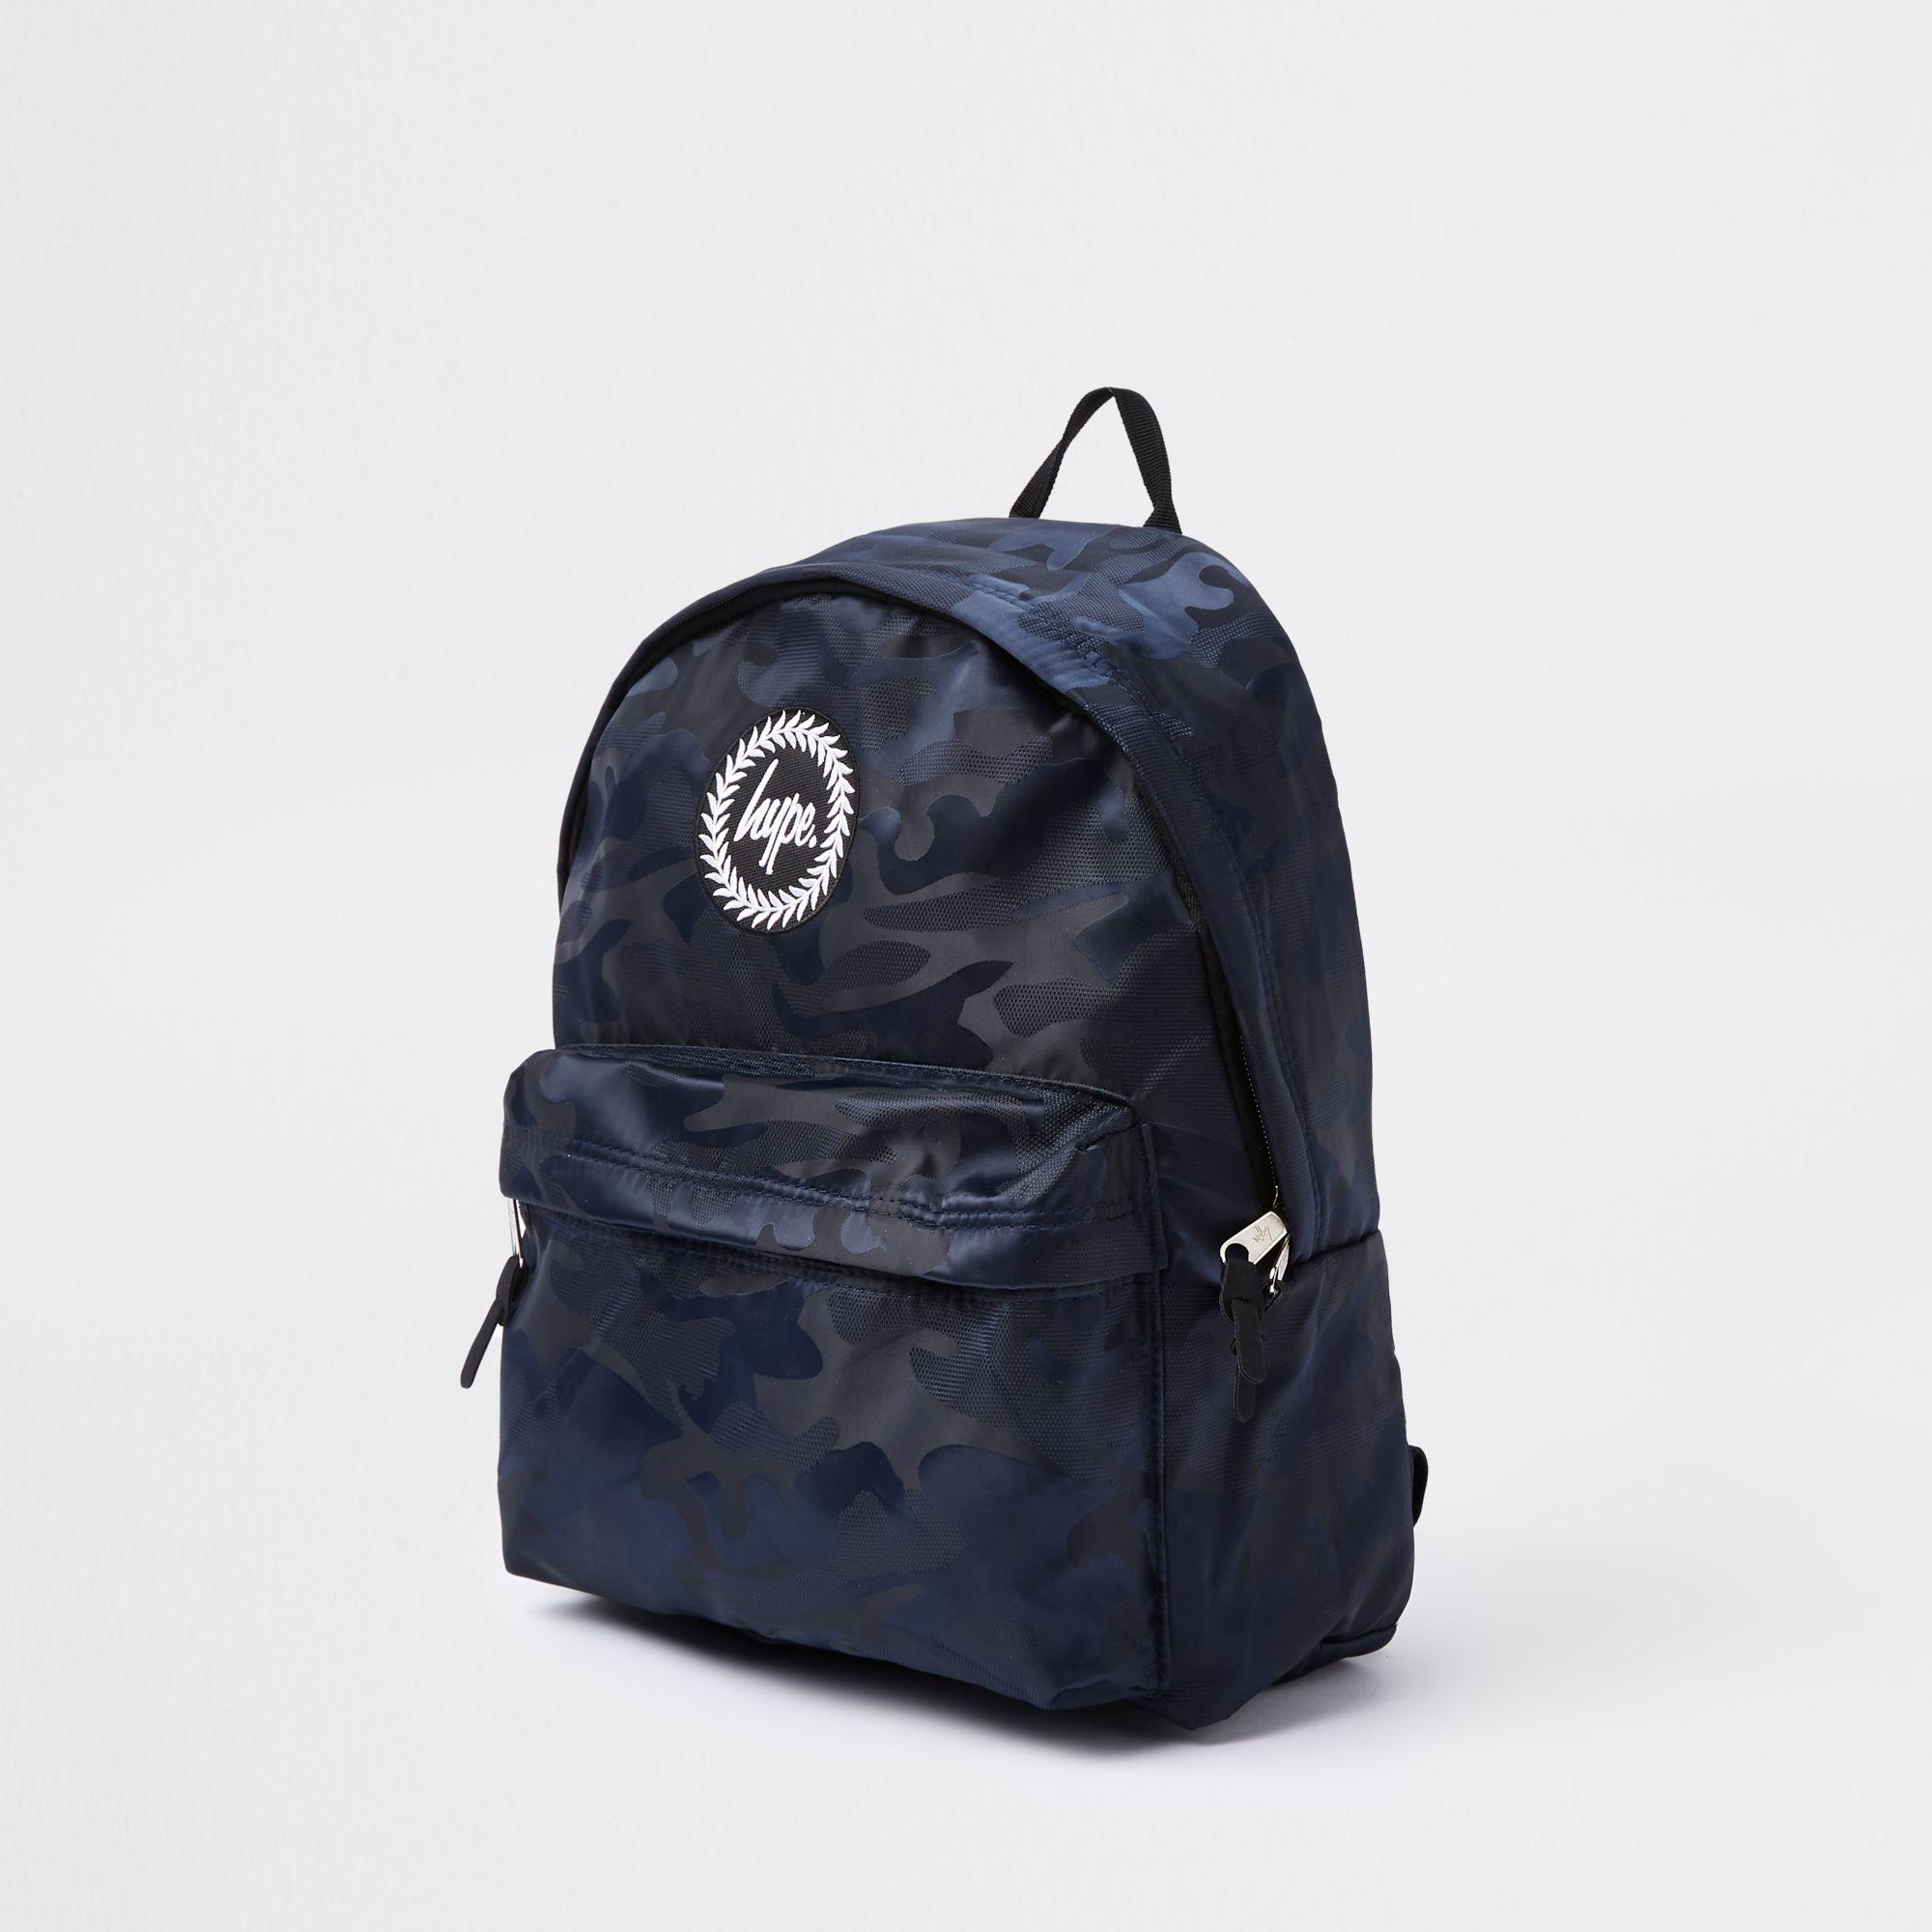 ea5bfc7f53 Hype Navy Camo Fade Backpack – Patmo Technologies Limited